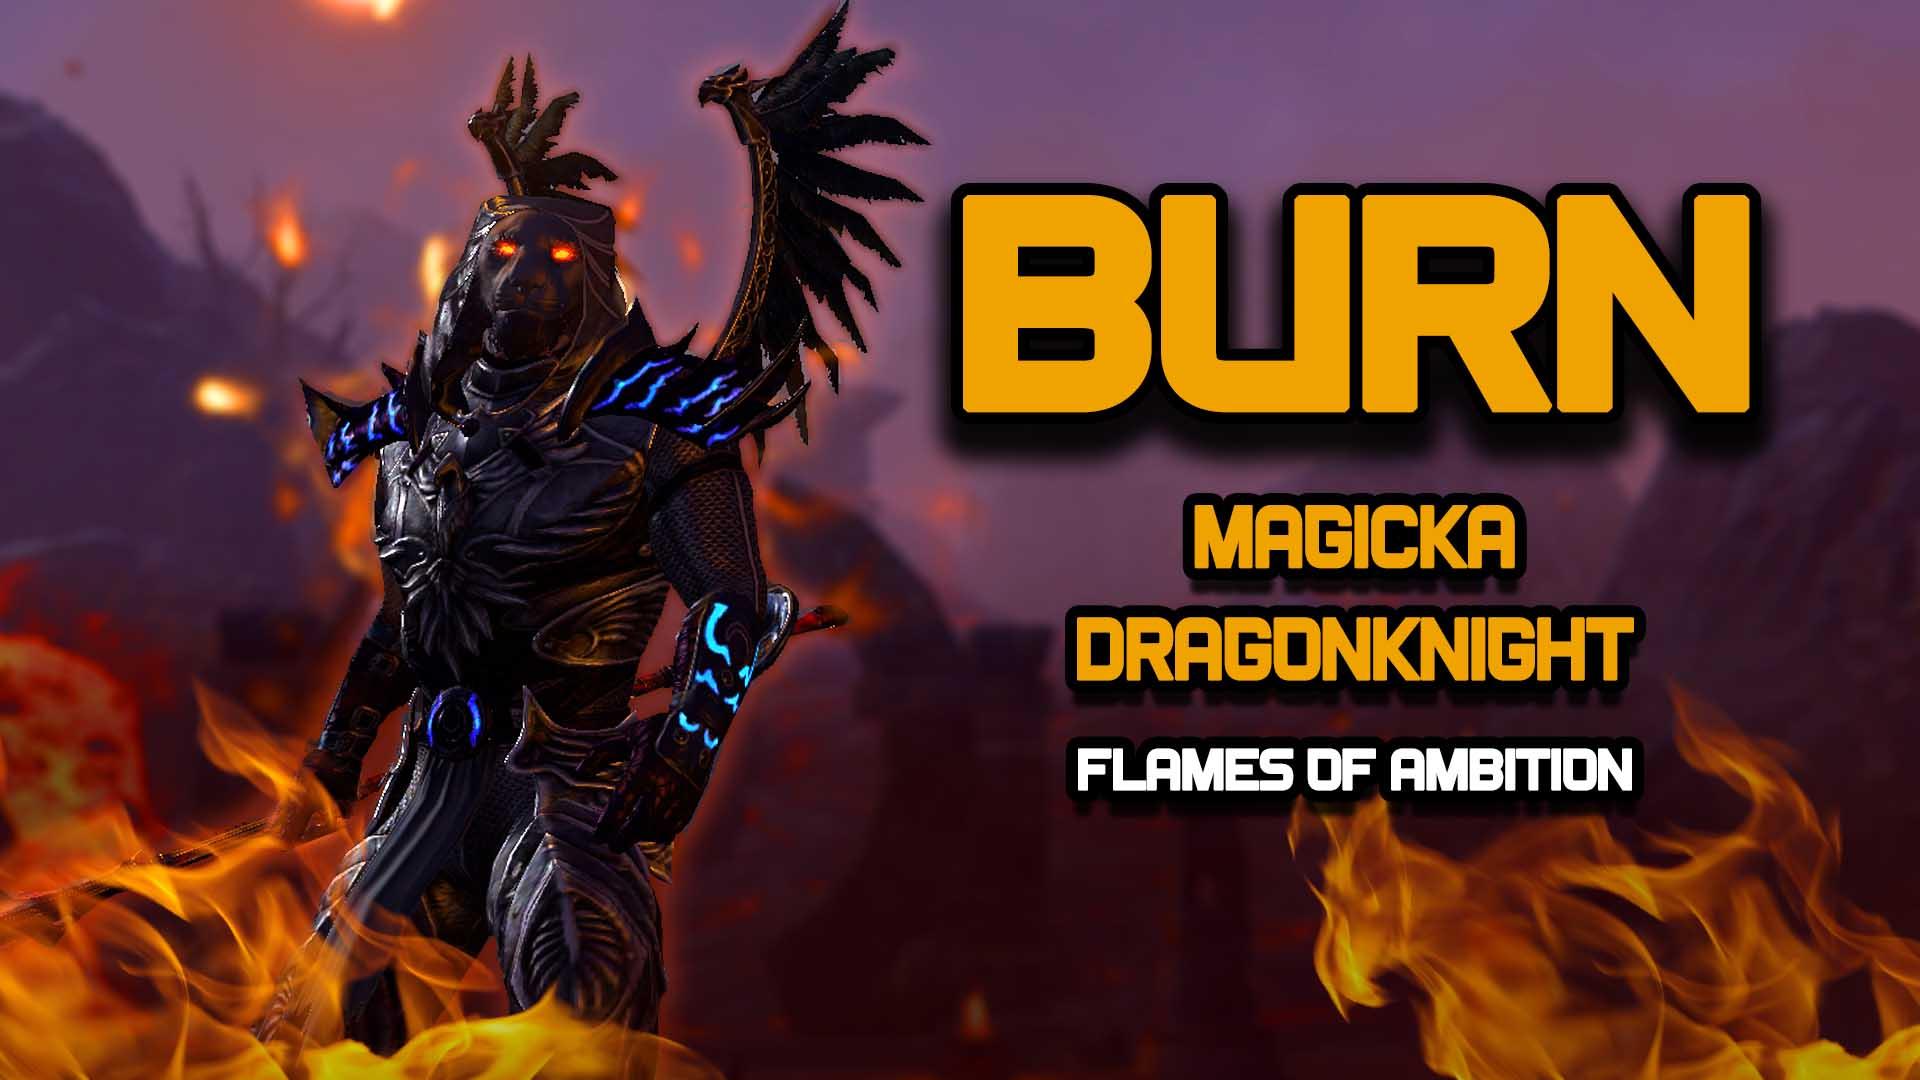 mag dk, magicka dragonknight, magdk, magicka dragonknight build, xynode, xynode gaming, xynode mag dk, burn, fire mage, burn build, flames of ambition, pve build, pve mag dk, easy mag dk